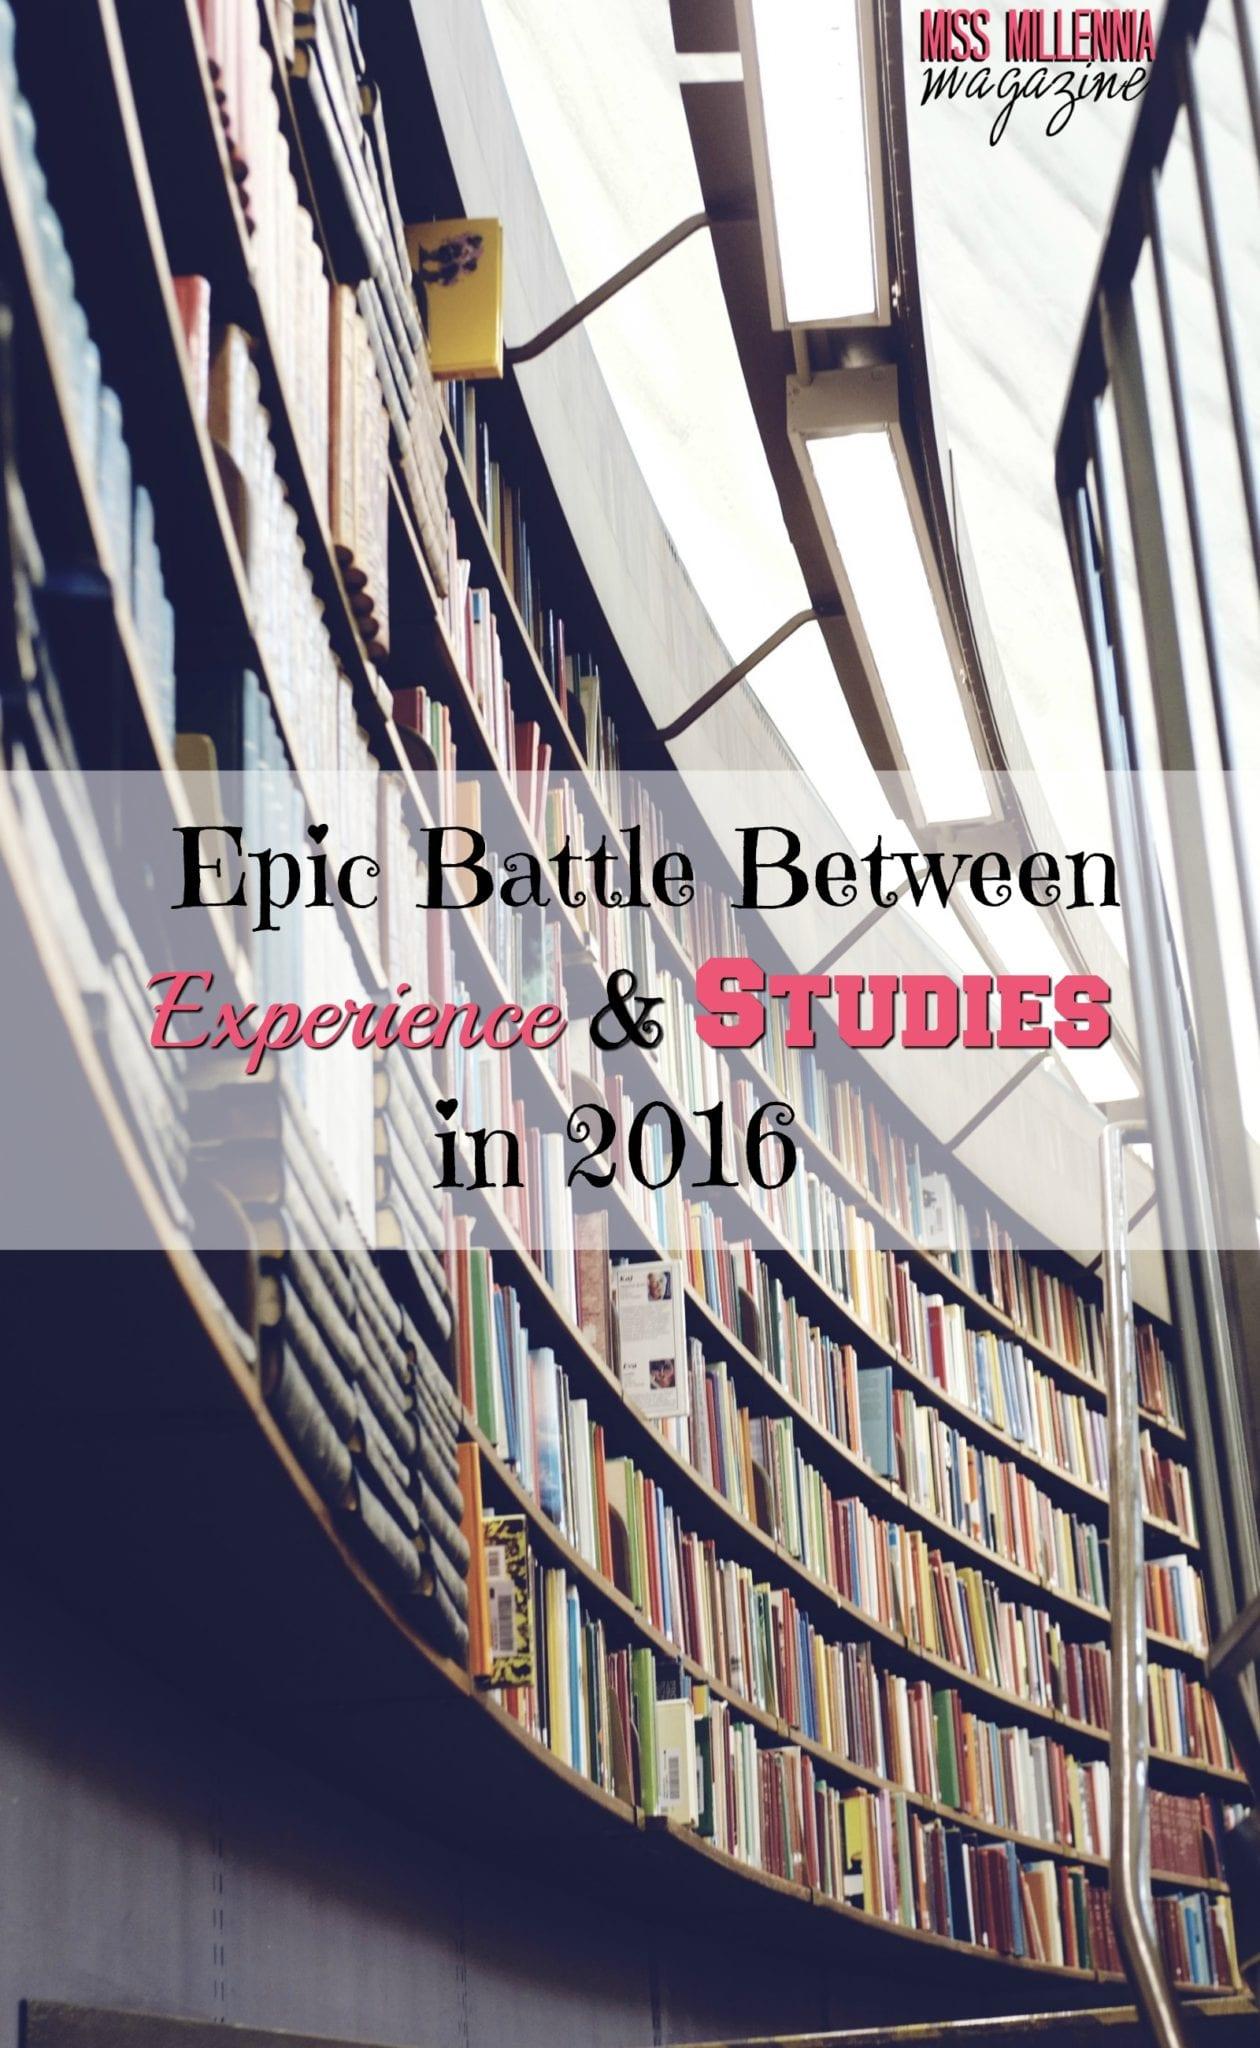 the-epic-battle-between-experience-studies-in-2016